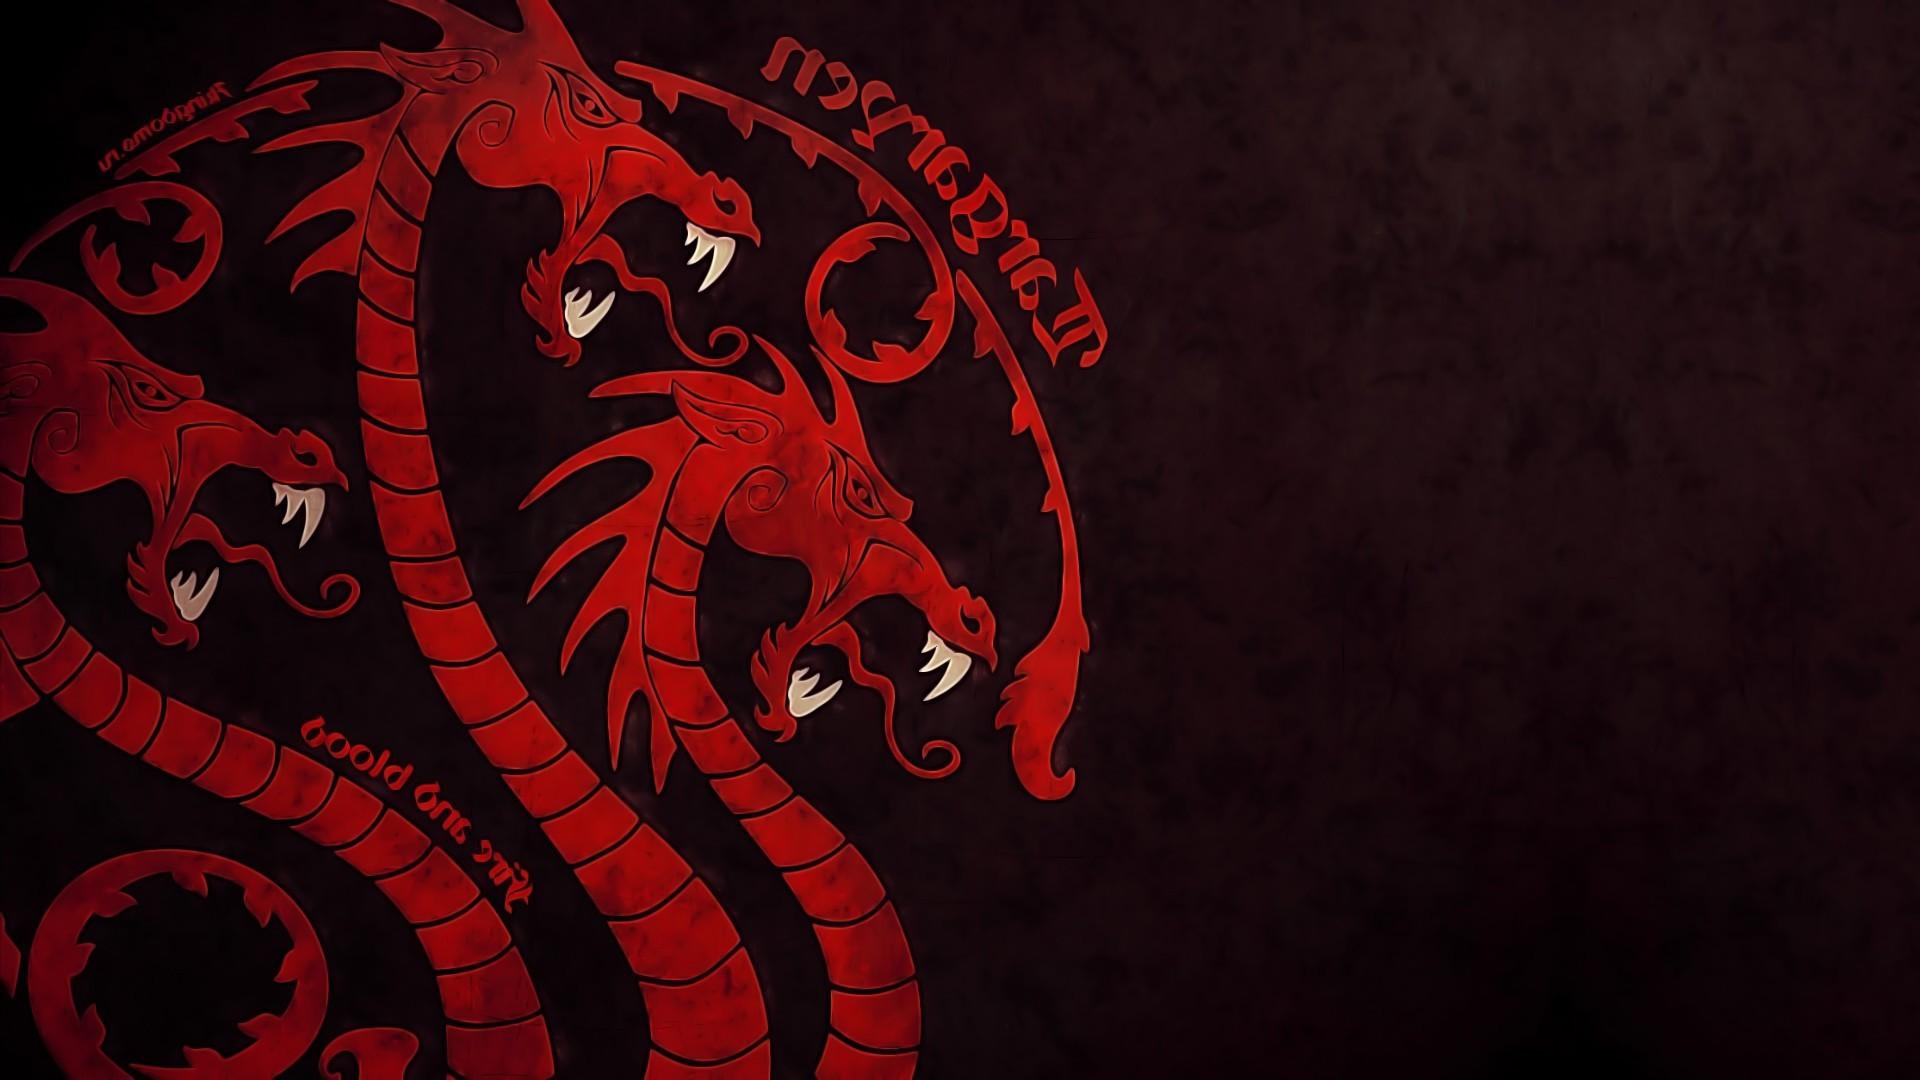 House Targaryen 26000 Hd Wallpaper Backgrounds Download